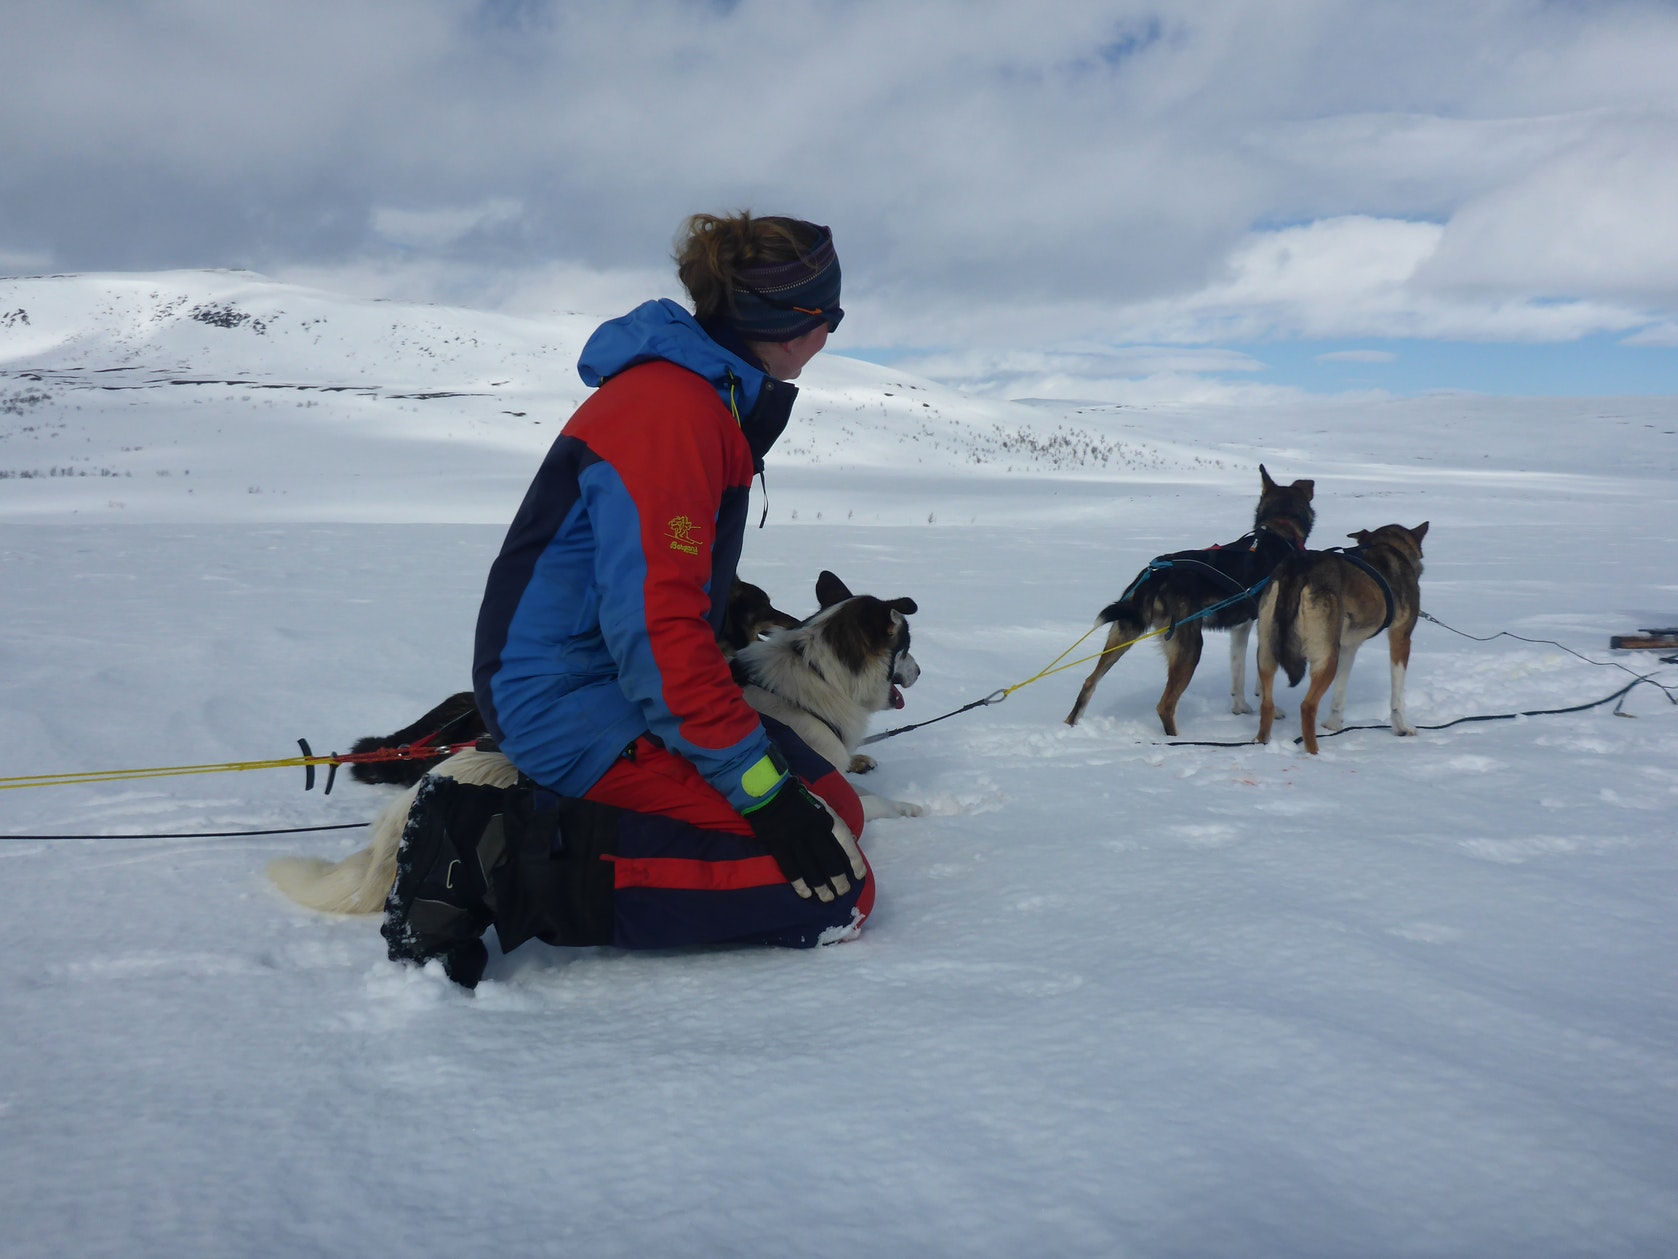 wintertour_mountaintour_arctic_6